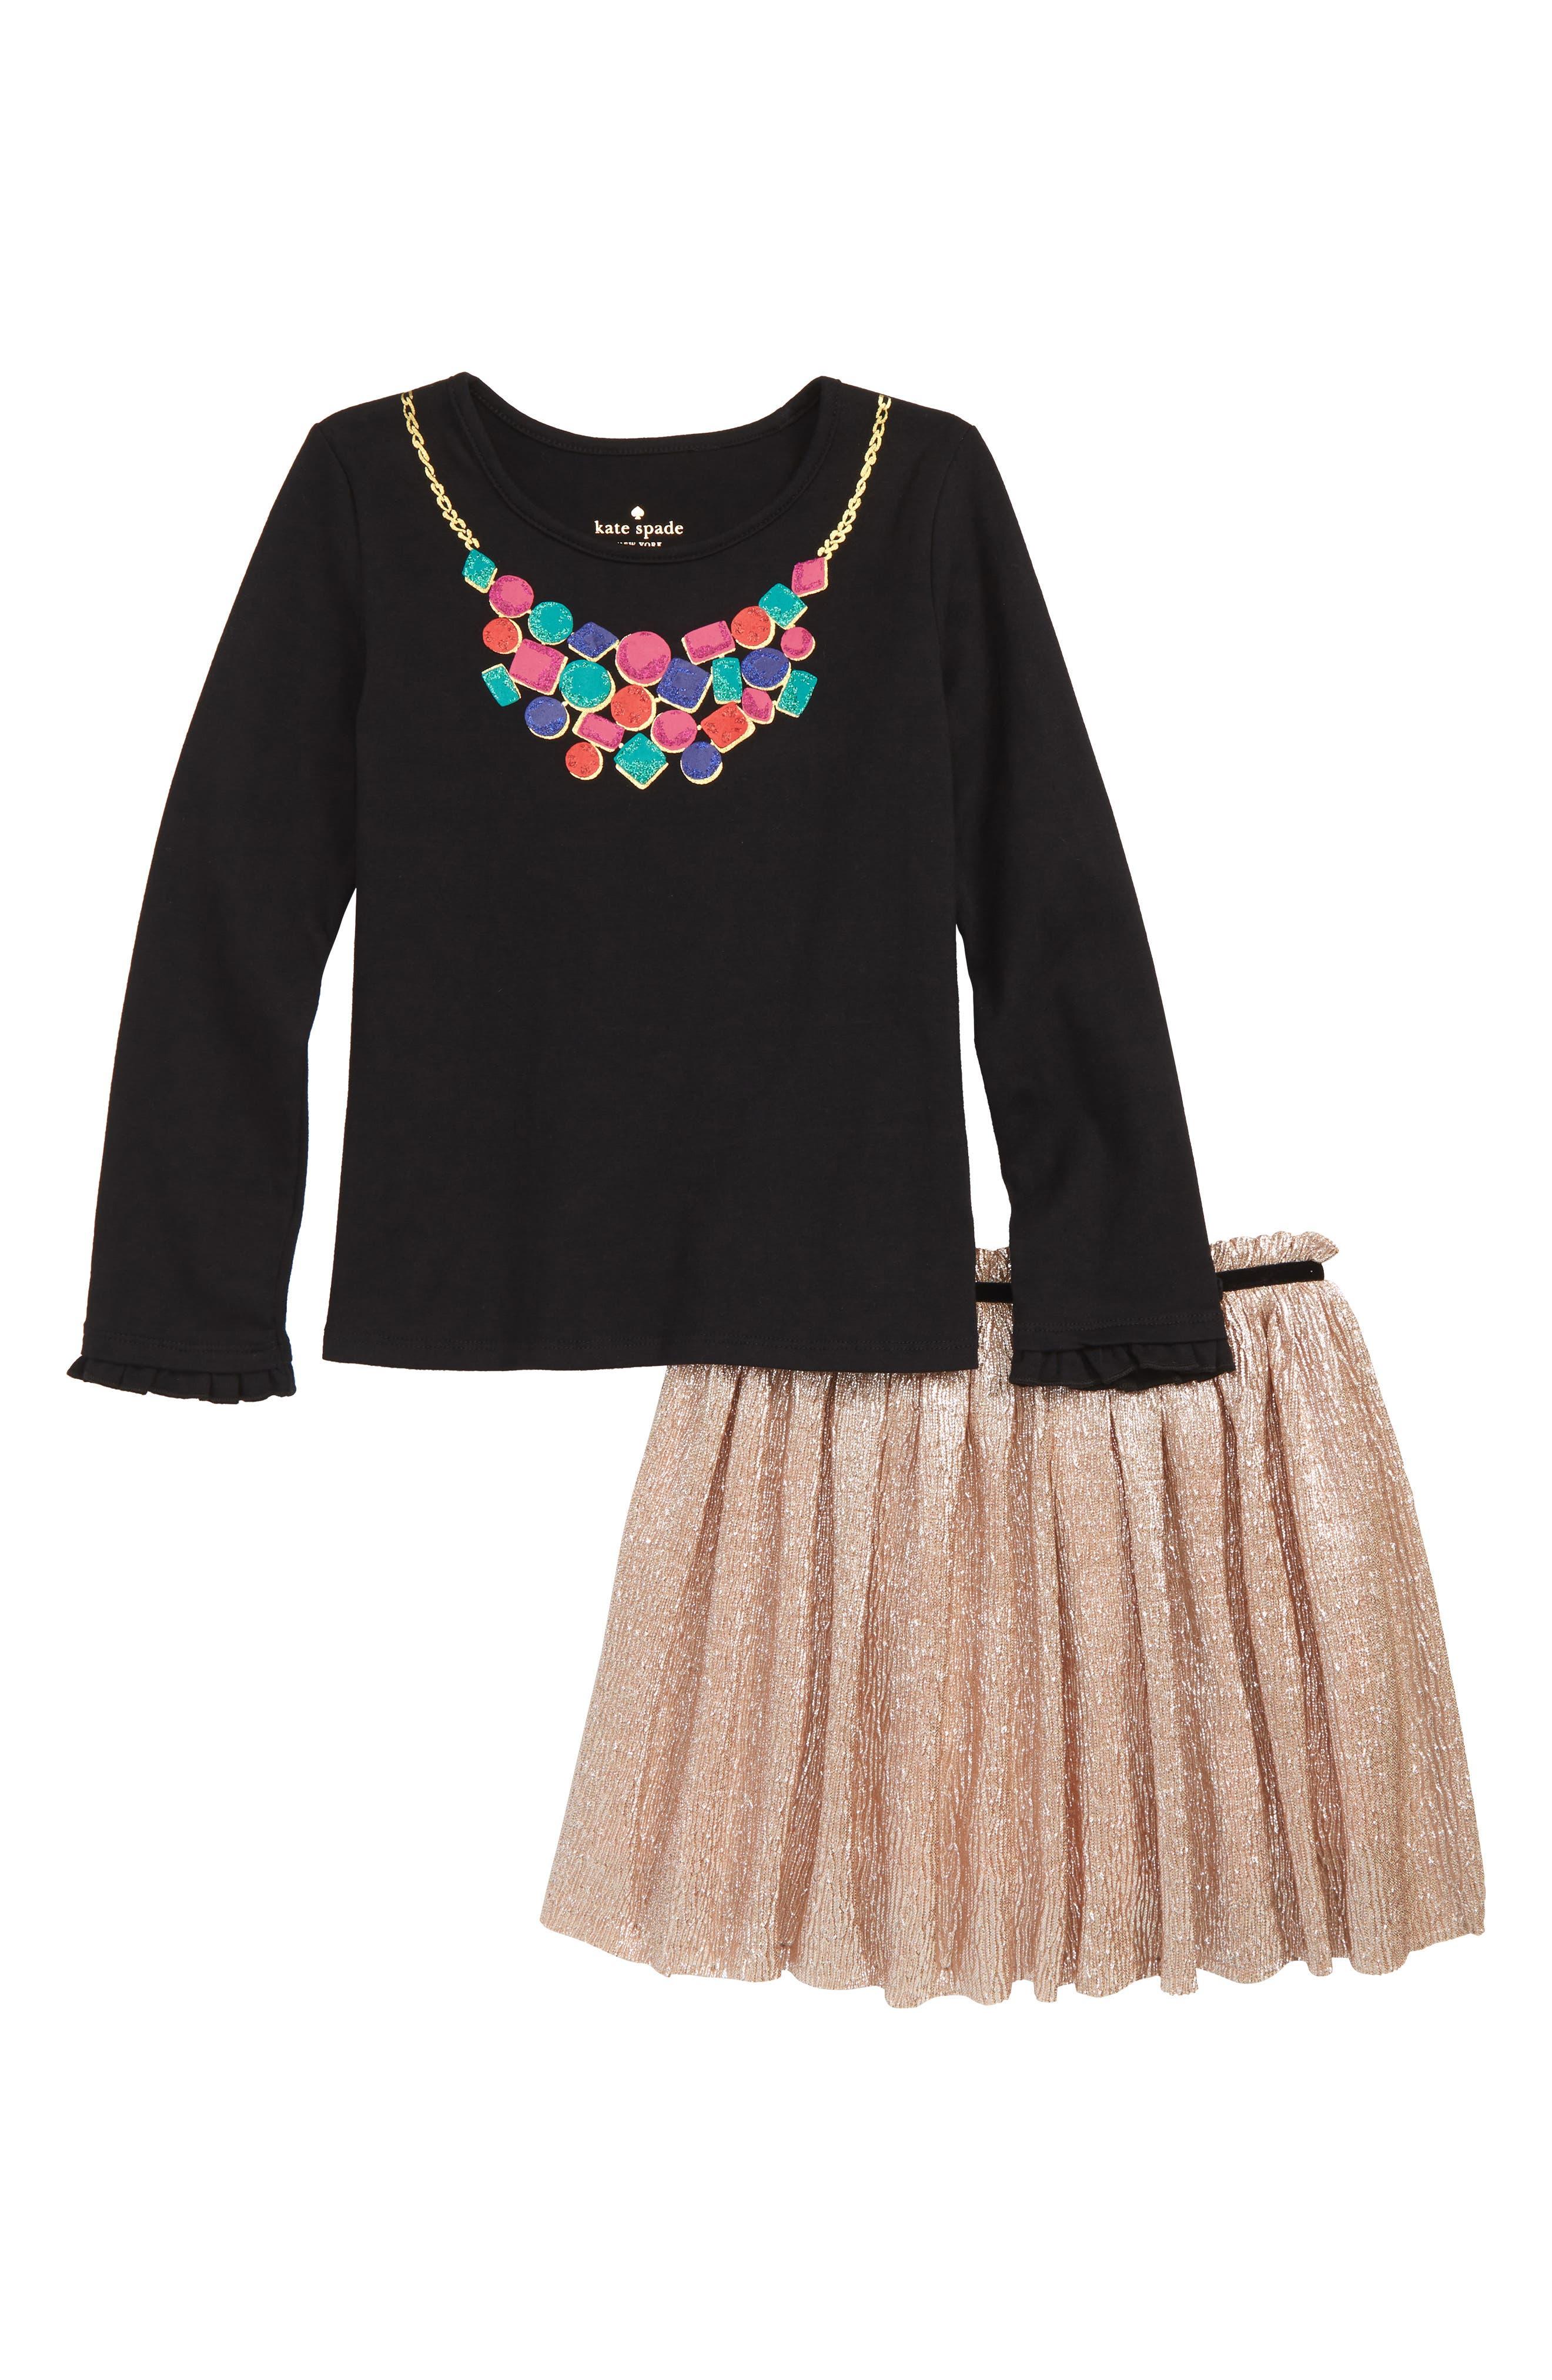 KATE SPADE NEW YORK, metallic knit skirt set, Main thumbnail 1, color, 001